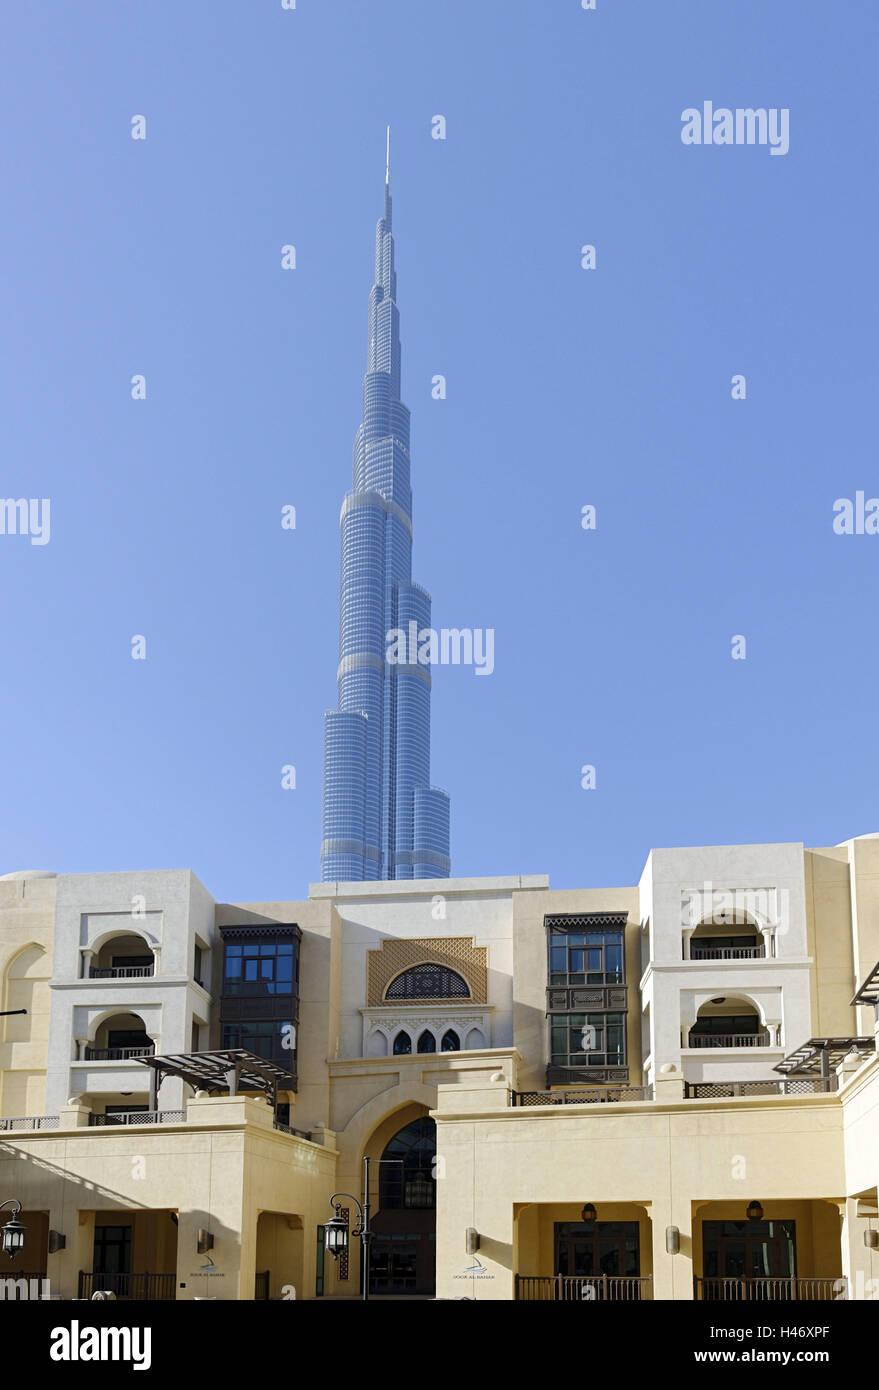 Souk Al Bahar and Burj Khalifa, Downtown Dubai, Dubai, United Arab Emirates, - Stock Image